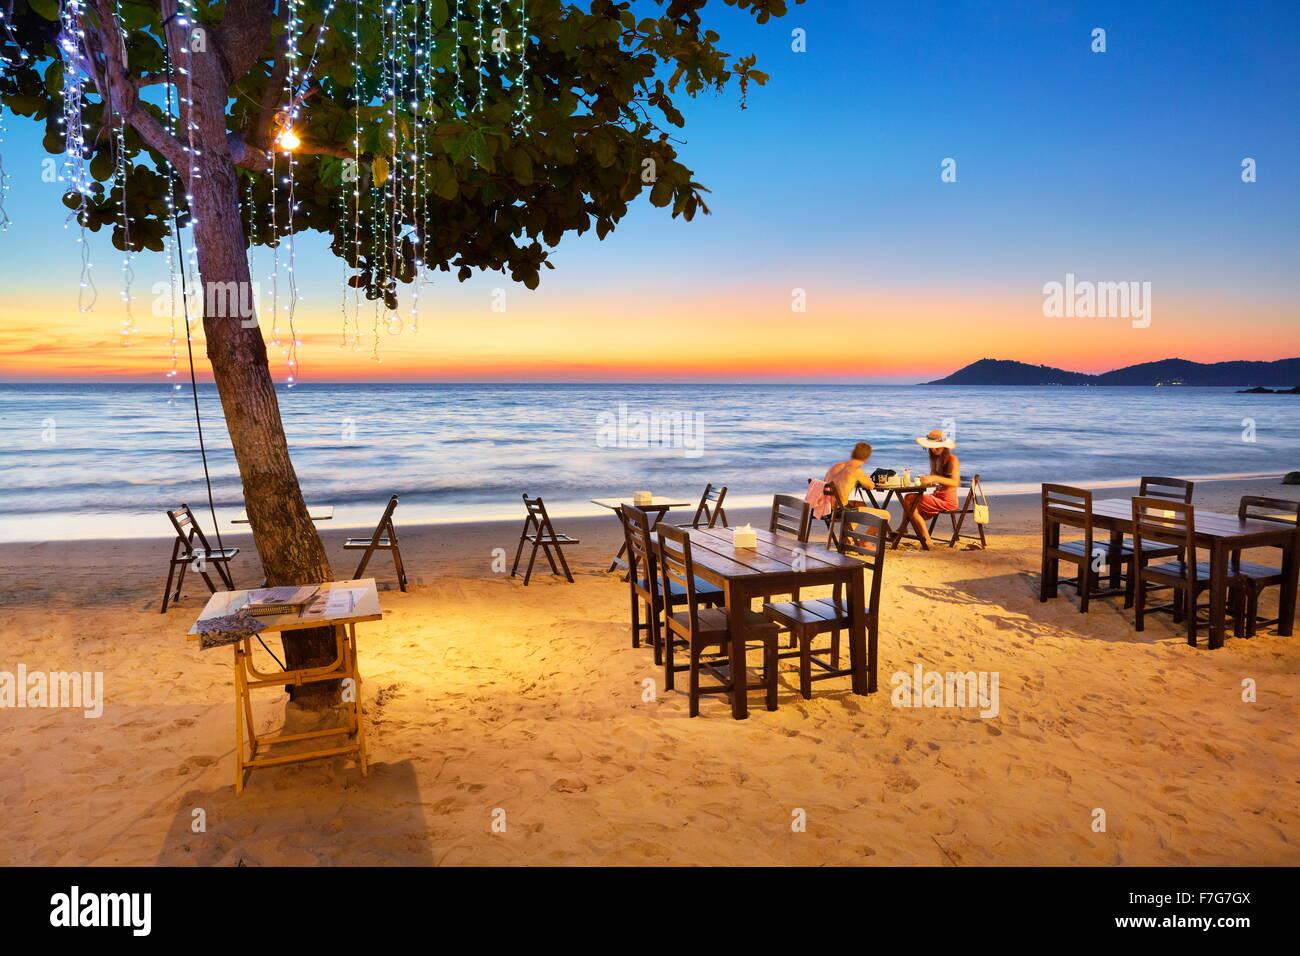 Restaurant am Strand nach Sonnenuntergang, Insel Koh Samet, Thailand Stockbild